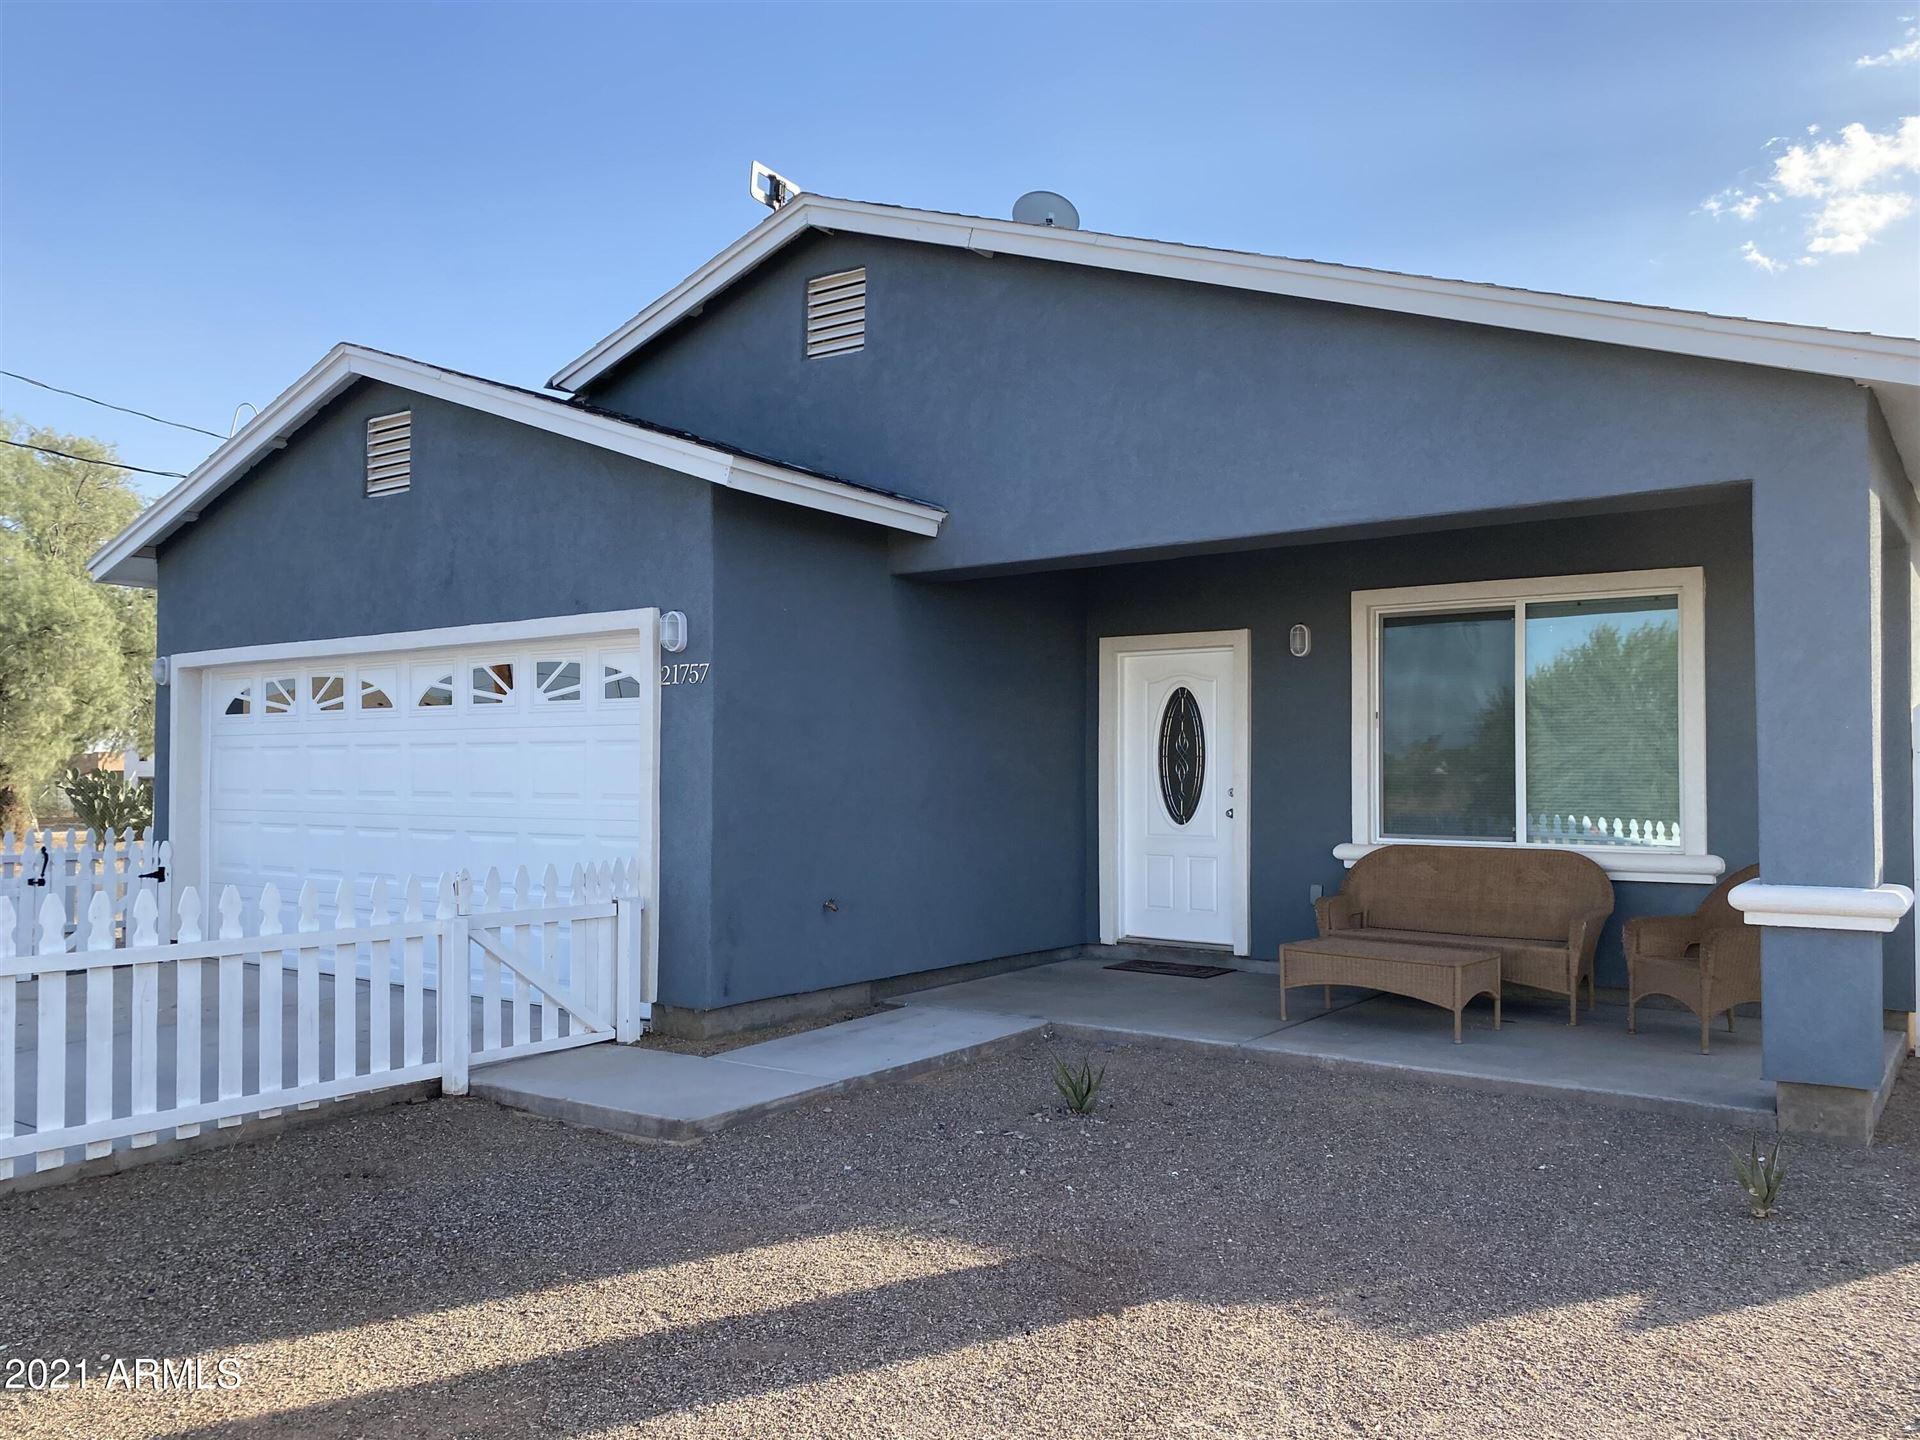 Photo of 21757 W HARDING Avenue, Wittmann, AZ 85361 (MLS # 6306138)